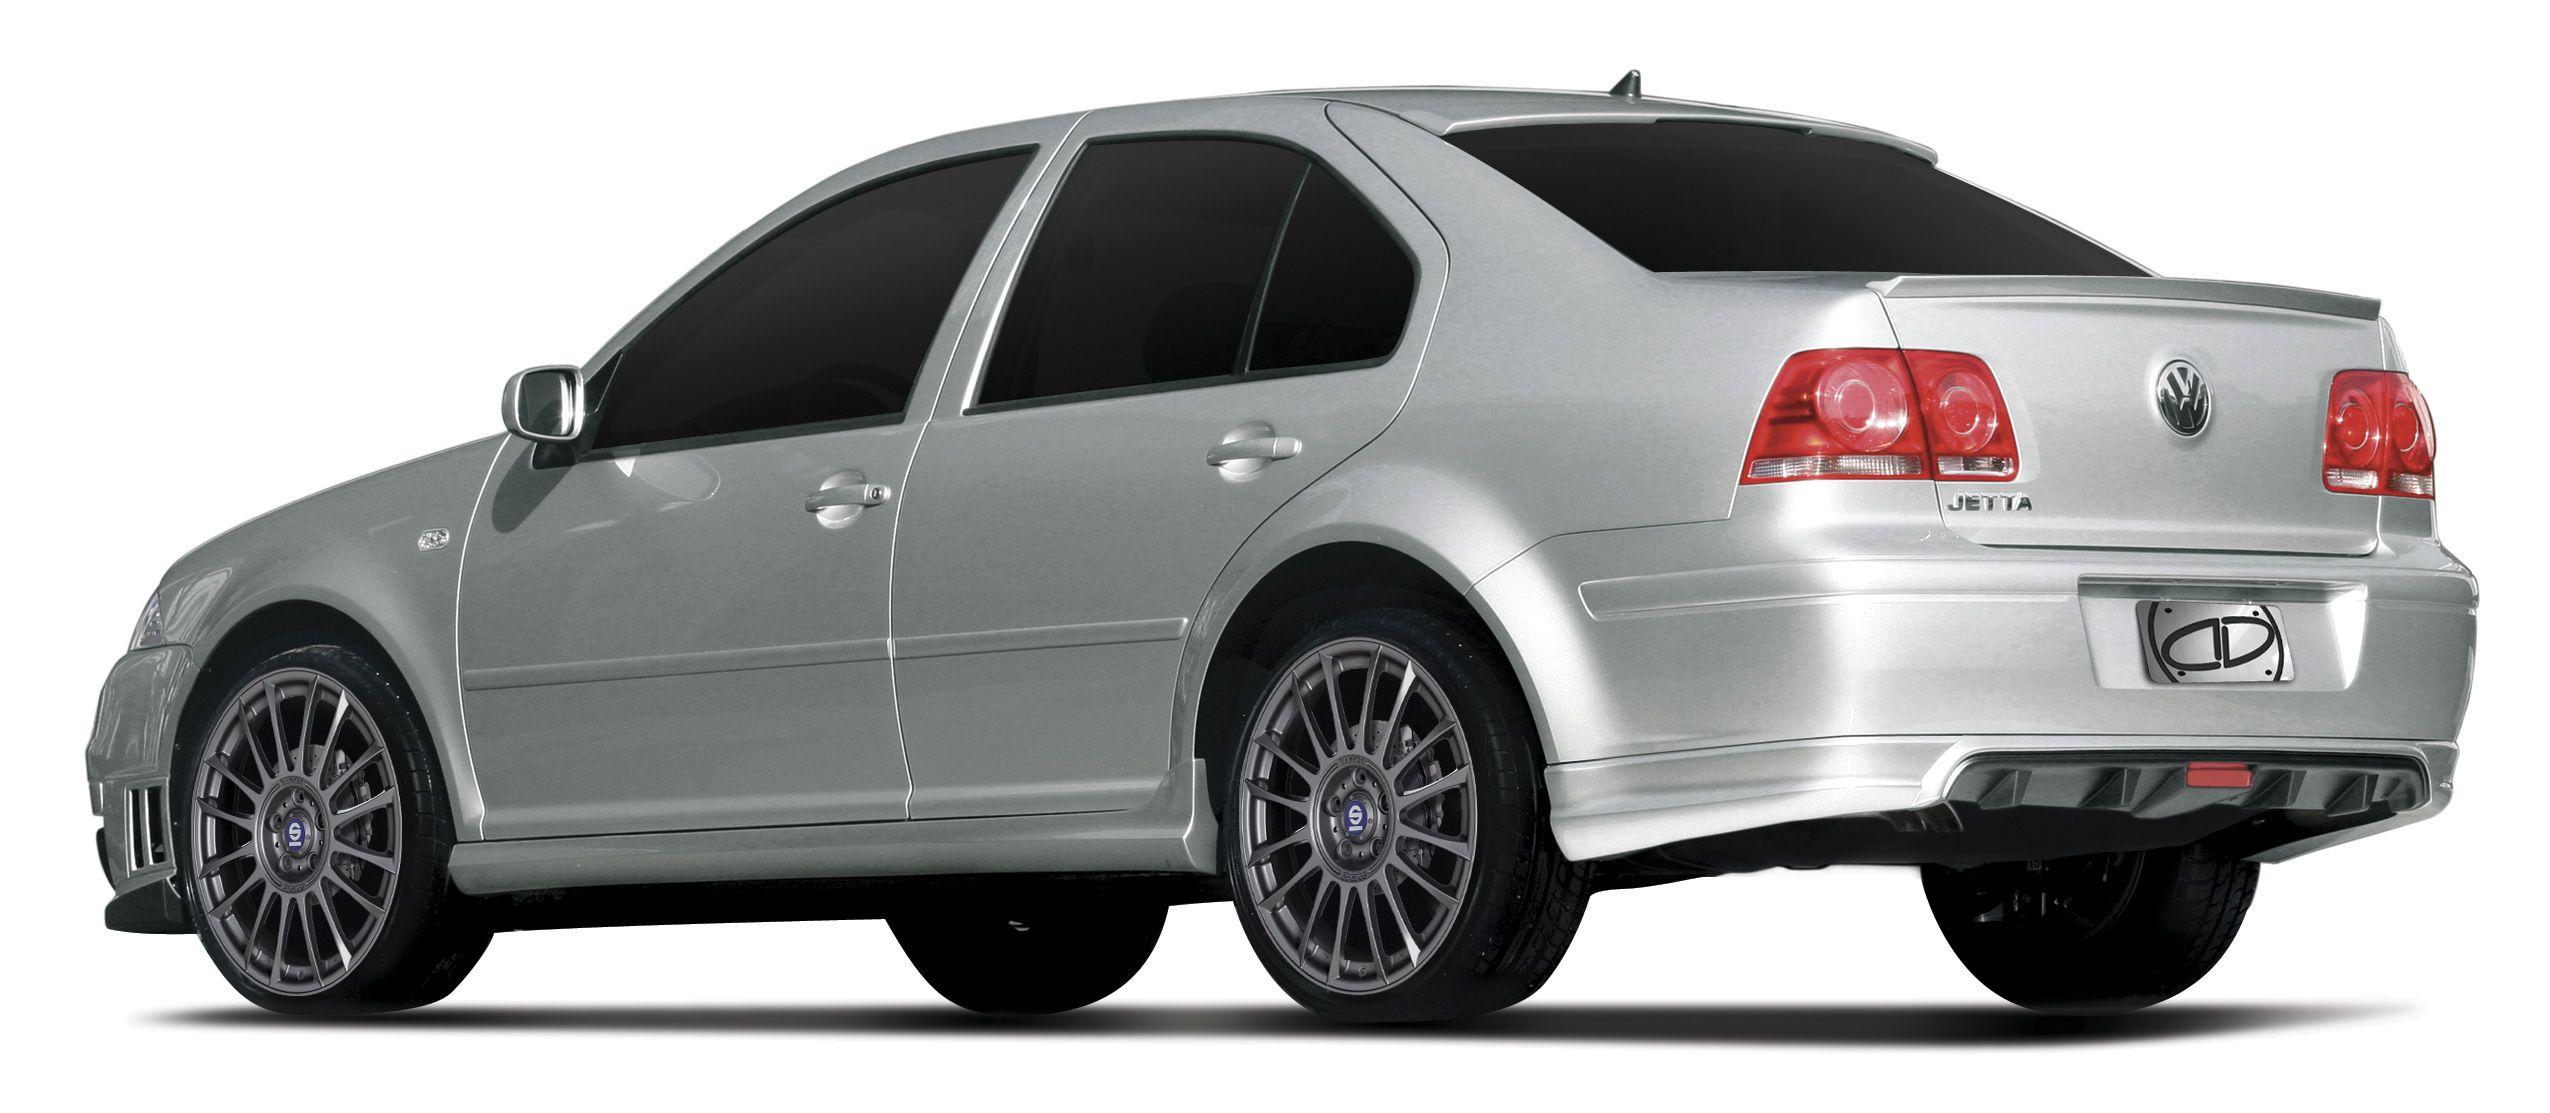 Top 25 best jetta clasico ideas on pinterest coberturas de asientos para coche de cuero volkswagen jetta clasico and asientos de carro de golf